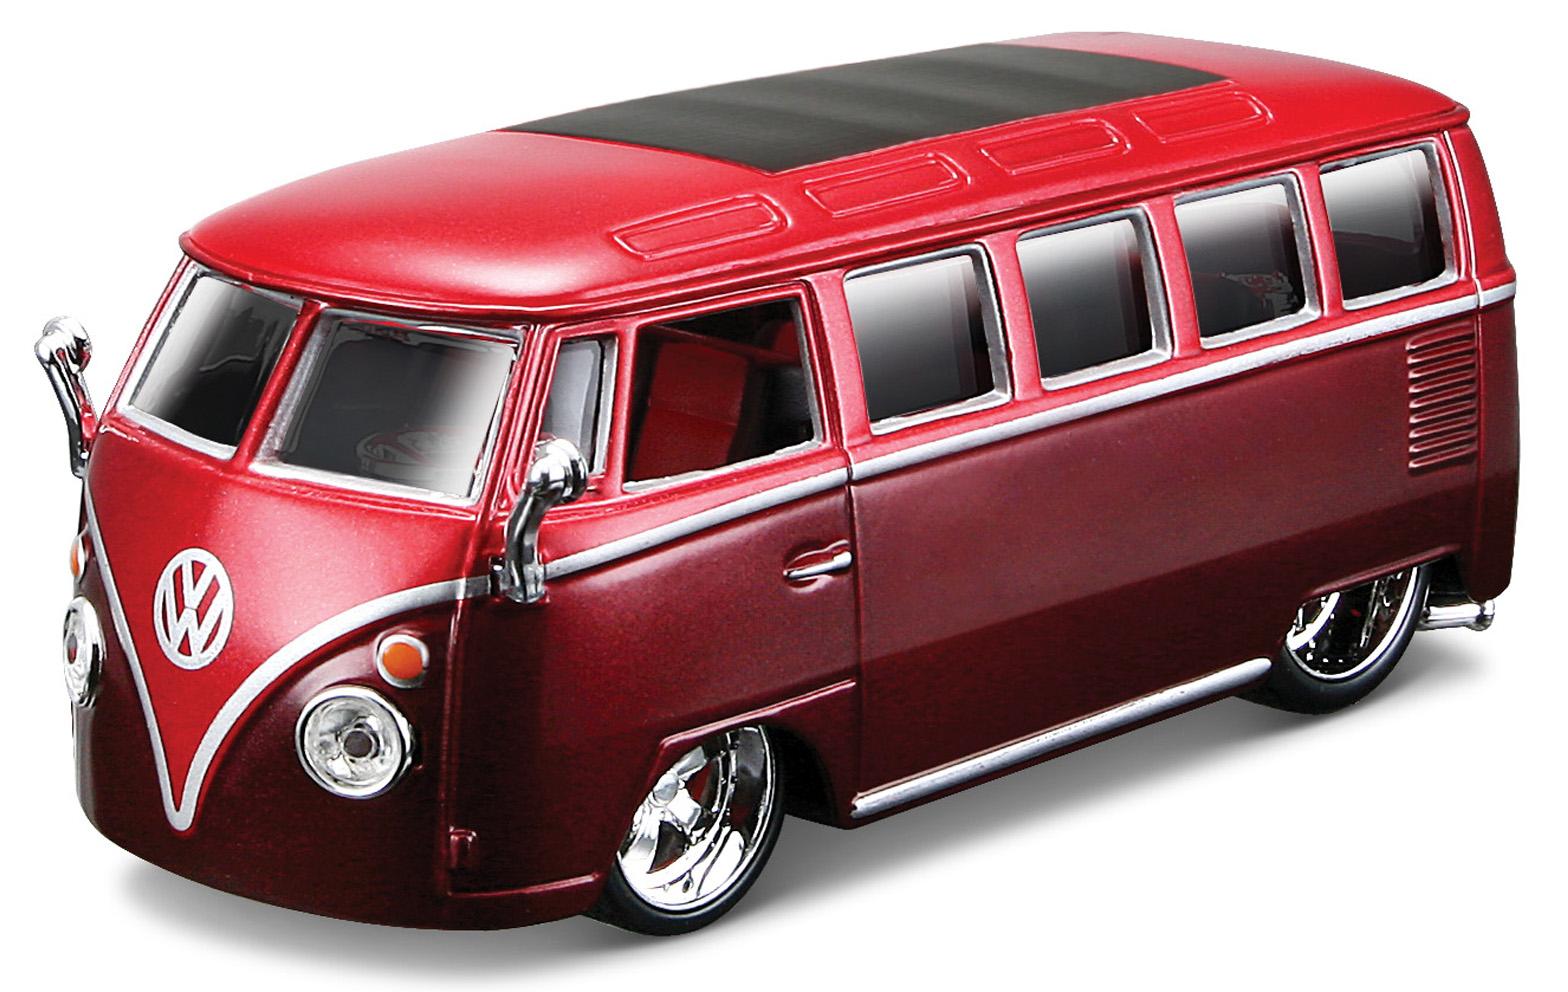 18-4200R Burago VW t1 samba 1op32